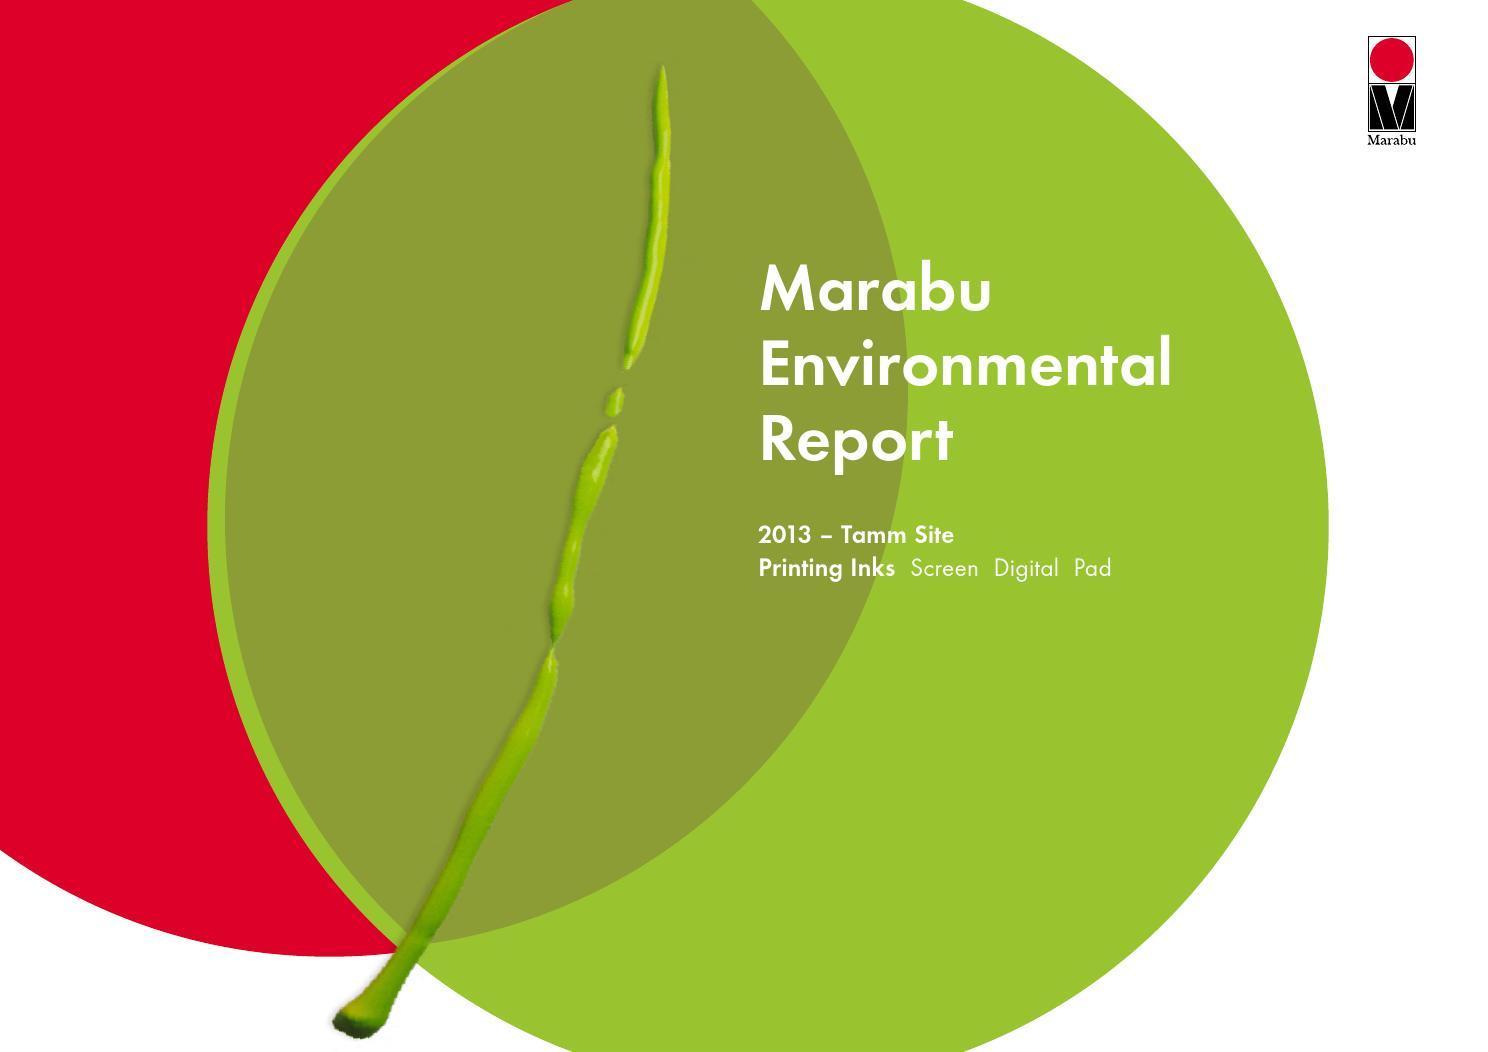 relat rio ambiental marabu 2013 by marabu gmbh co kg issuu. Black Bedroom Furniture Sets. Home Design Ideas